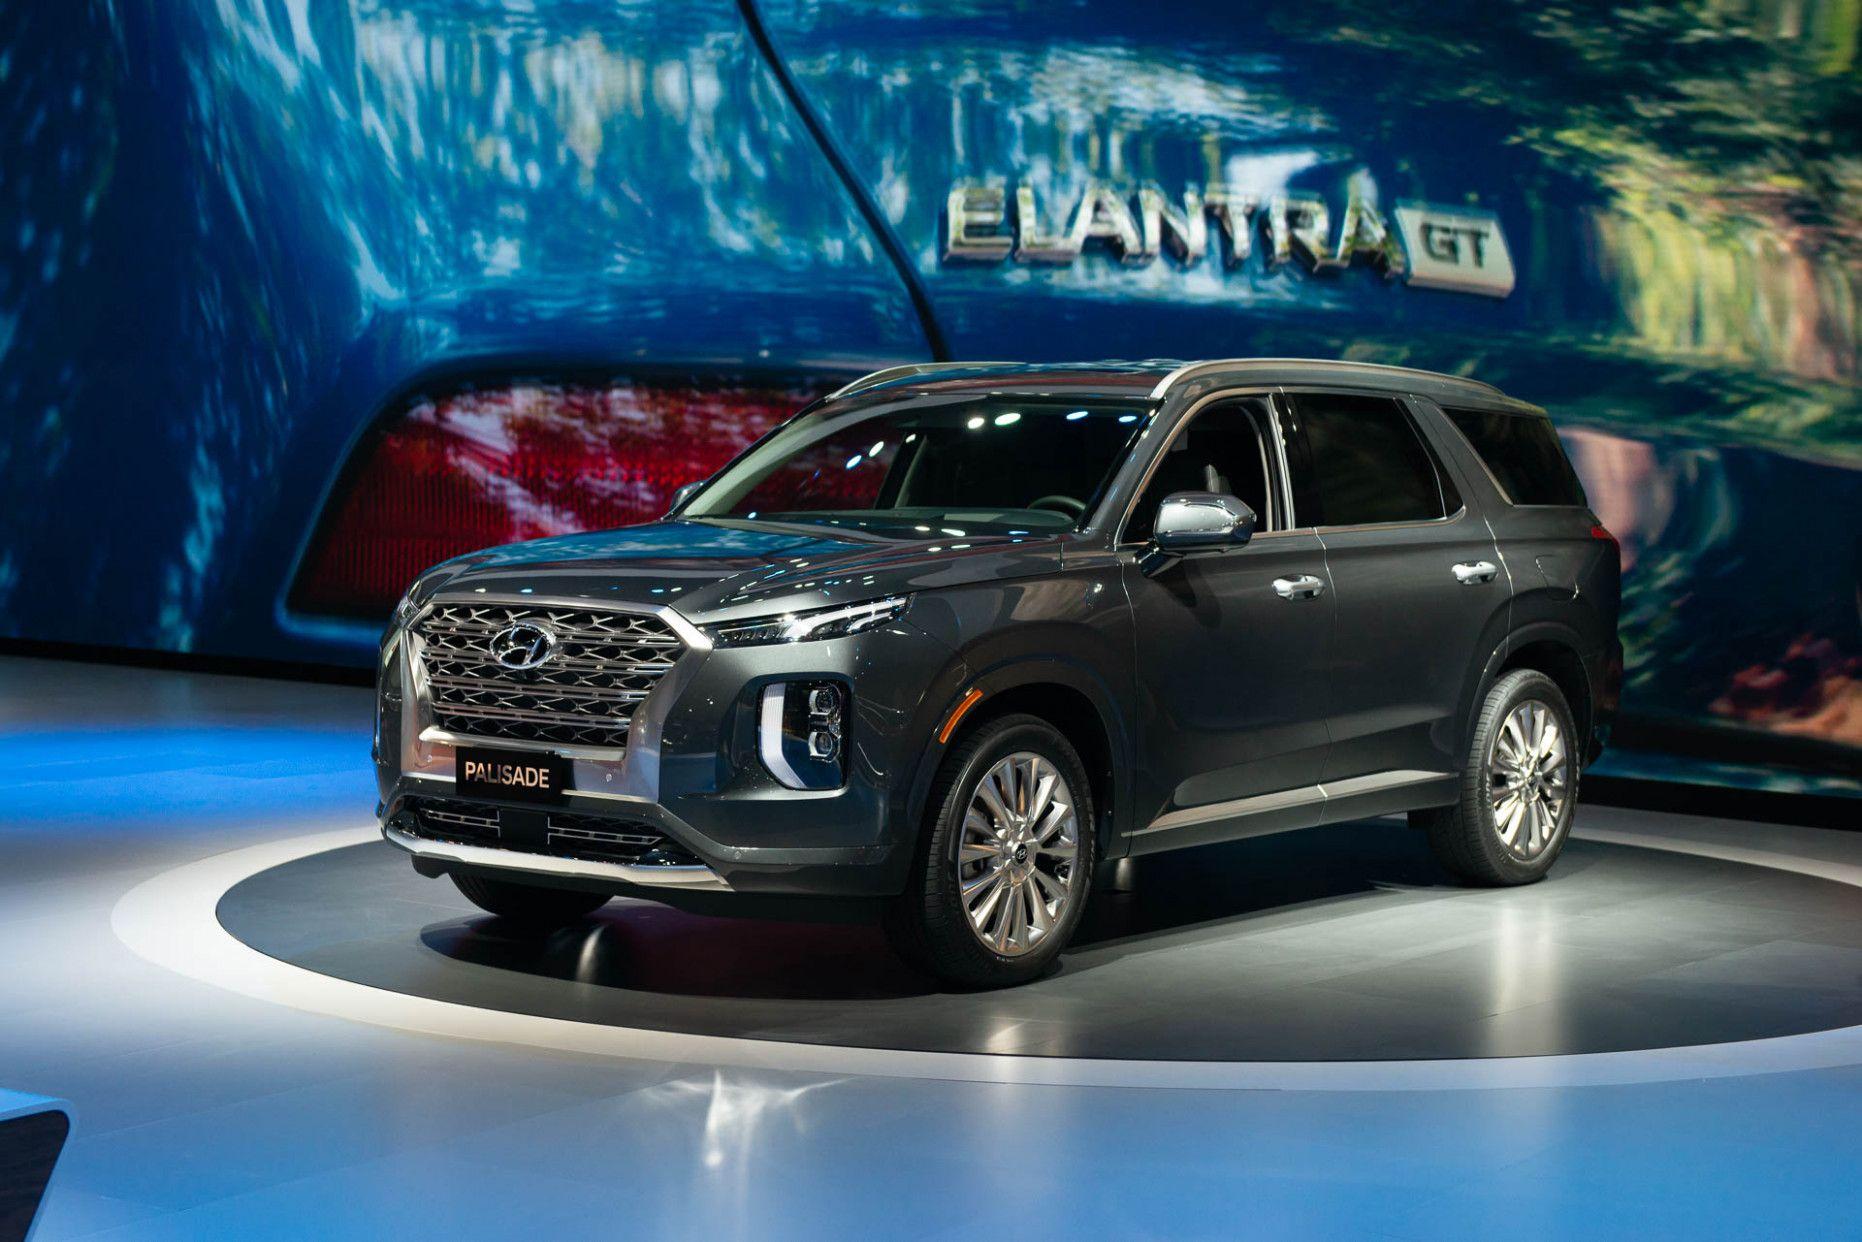 2020 Hyundai Suv in 2020 Hyundai suv, Large suv, Suv